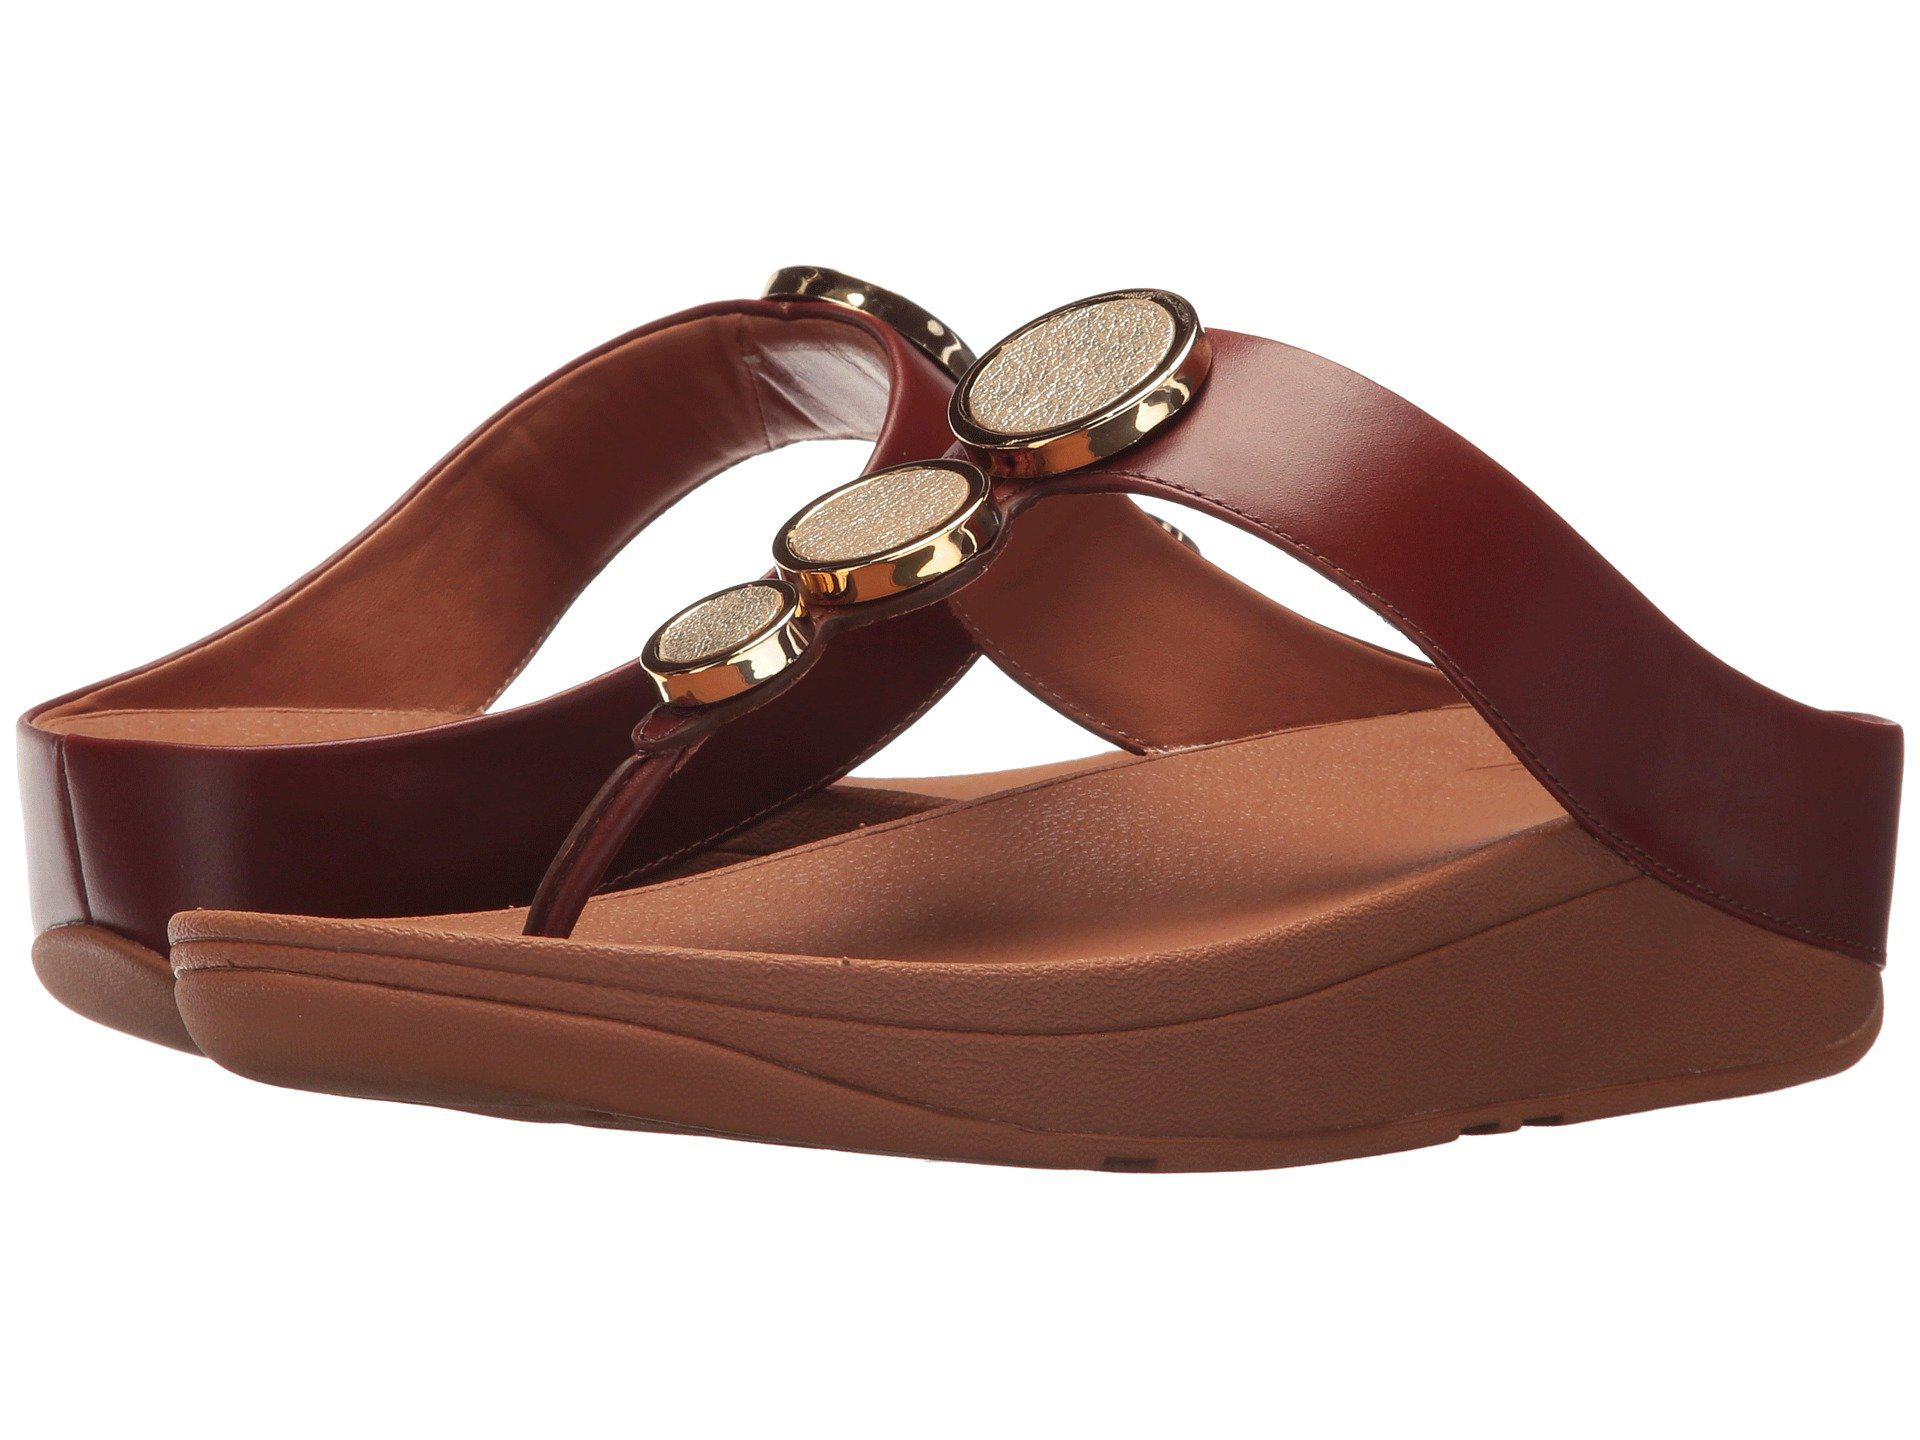 97e682ca5da Lyst - Fitflop Halo Toe Thong Sandals in Brown